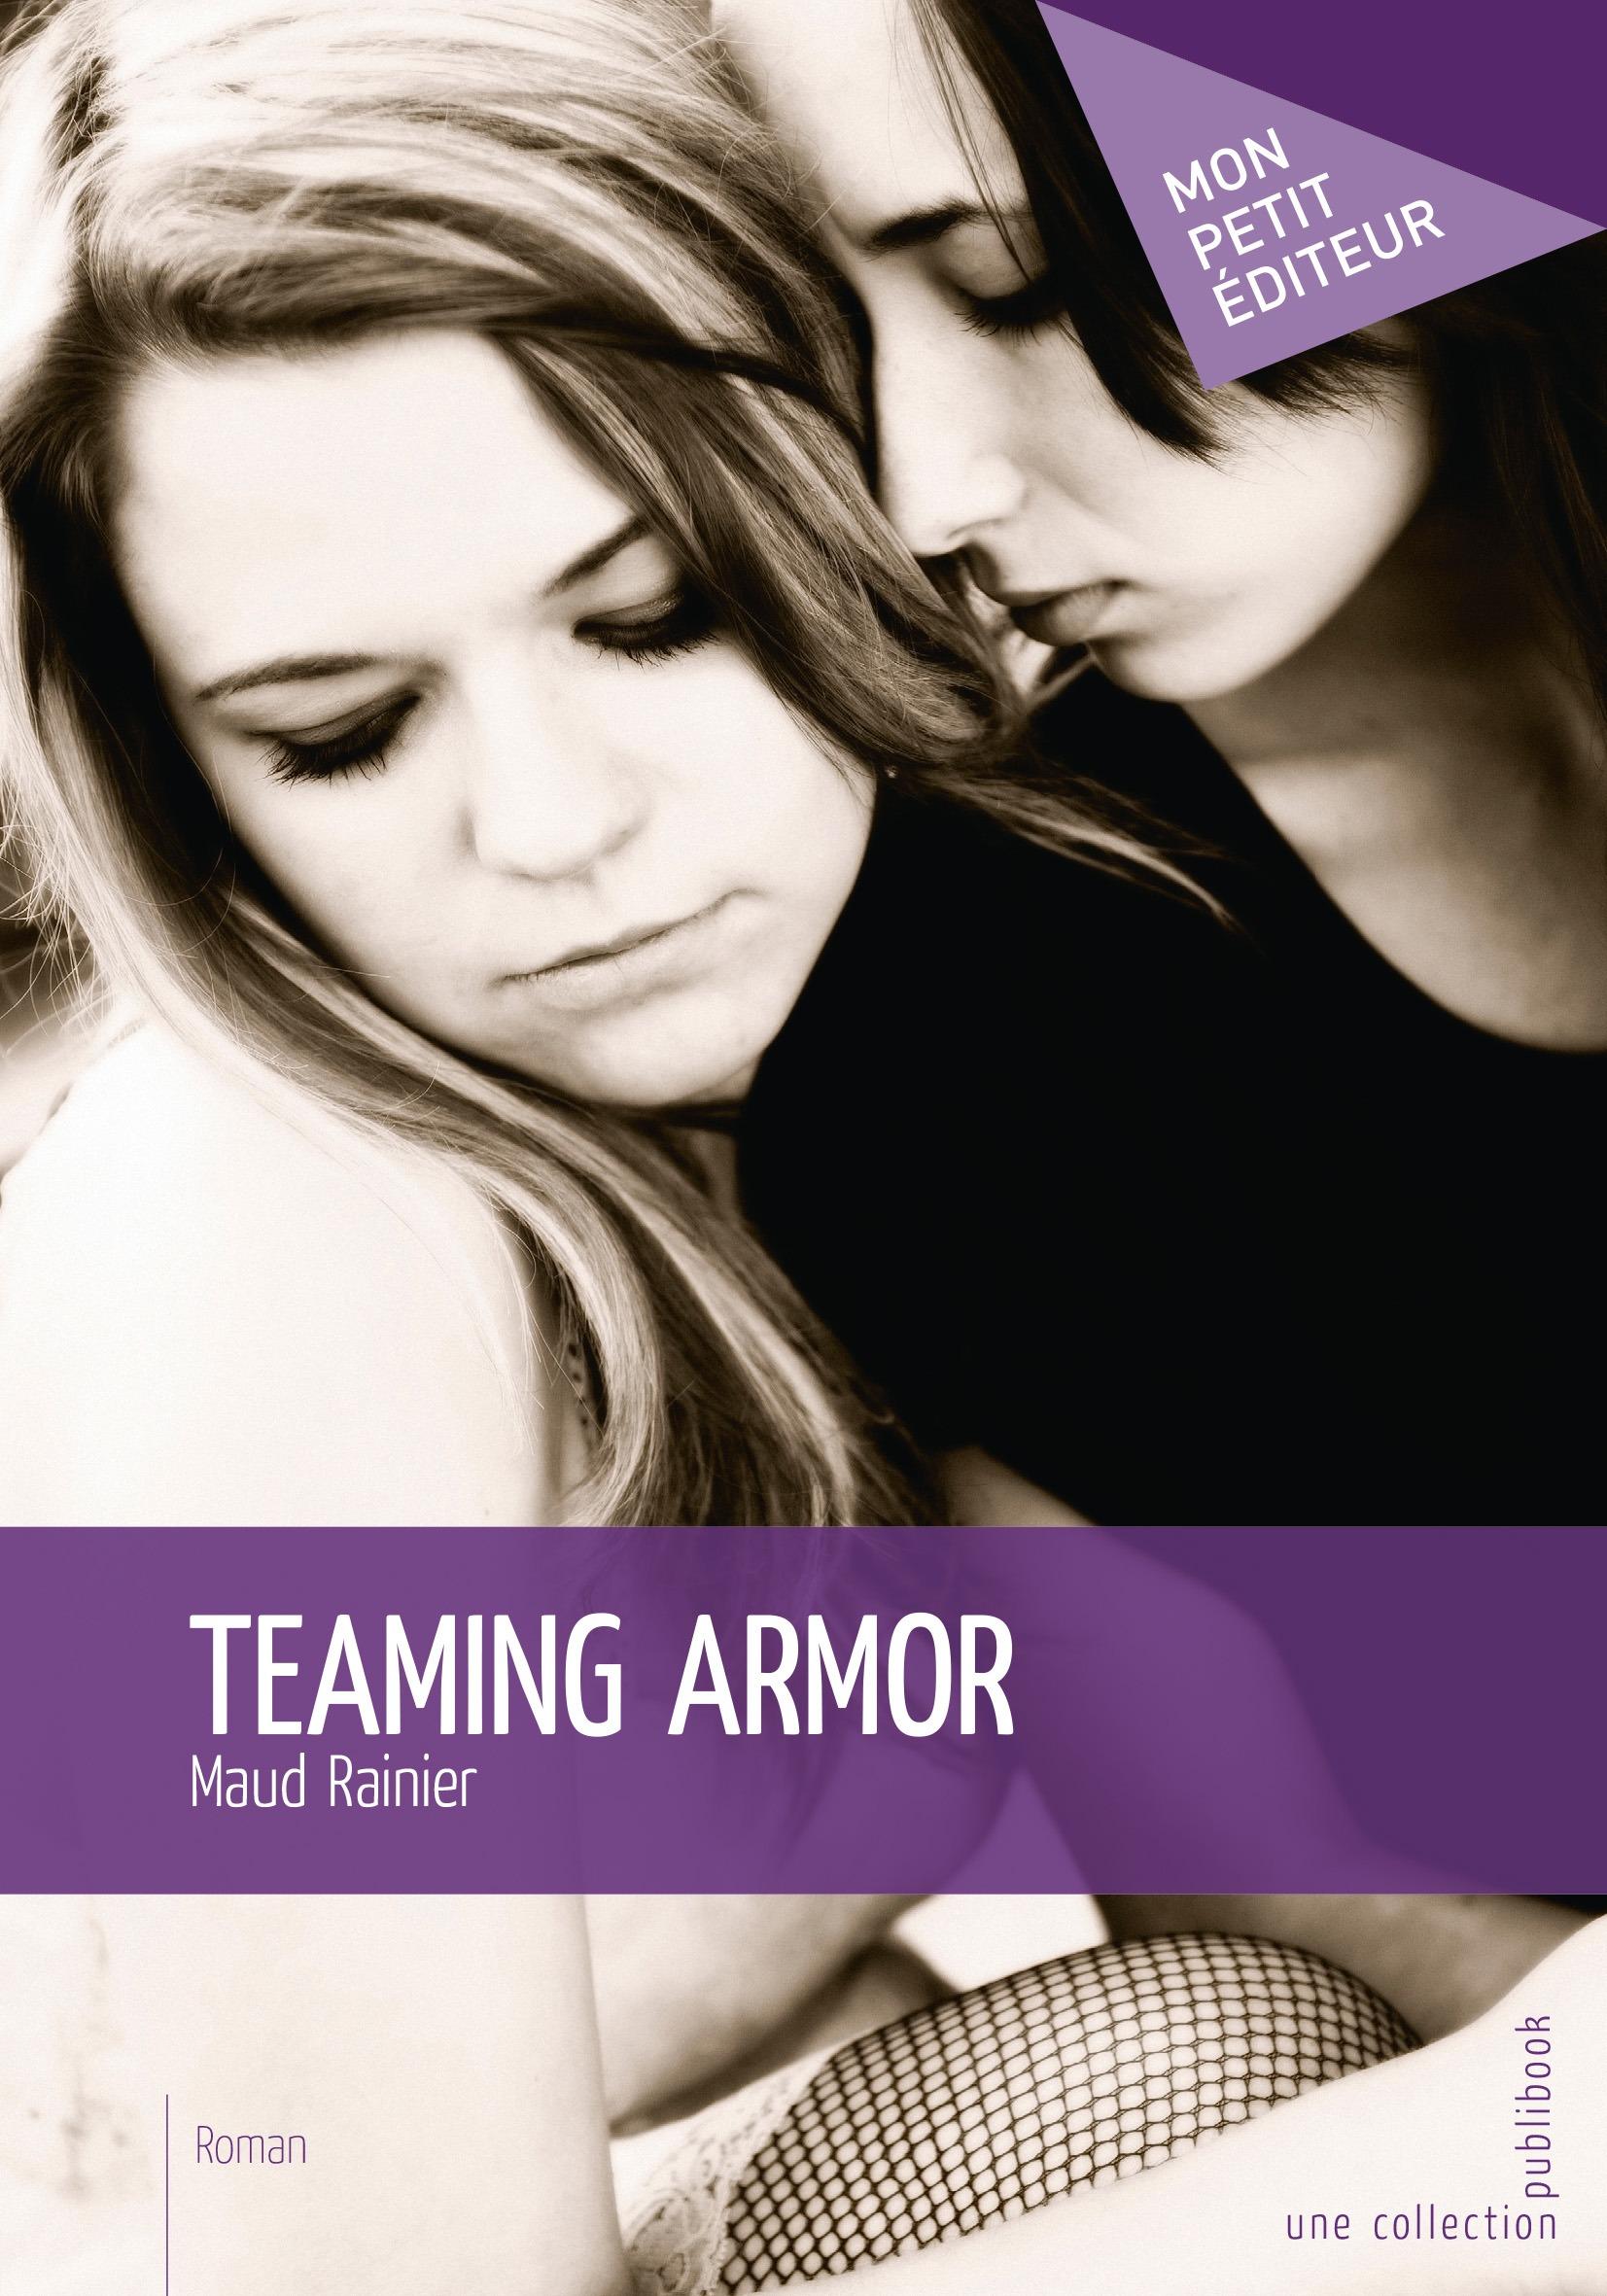 Teaming Armor